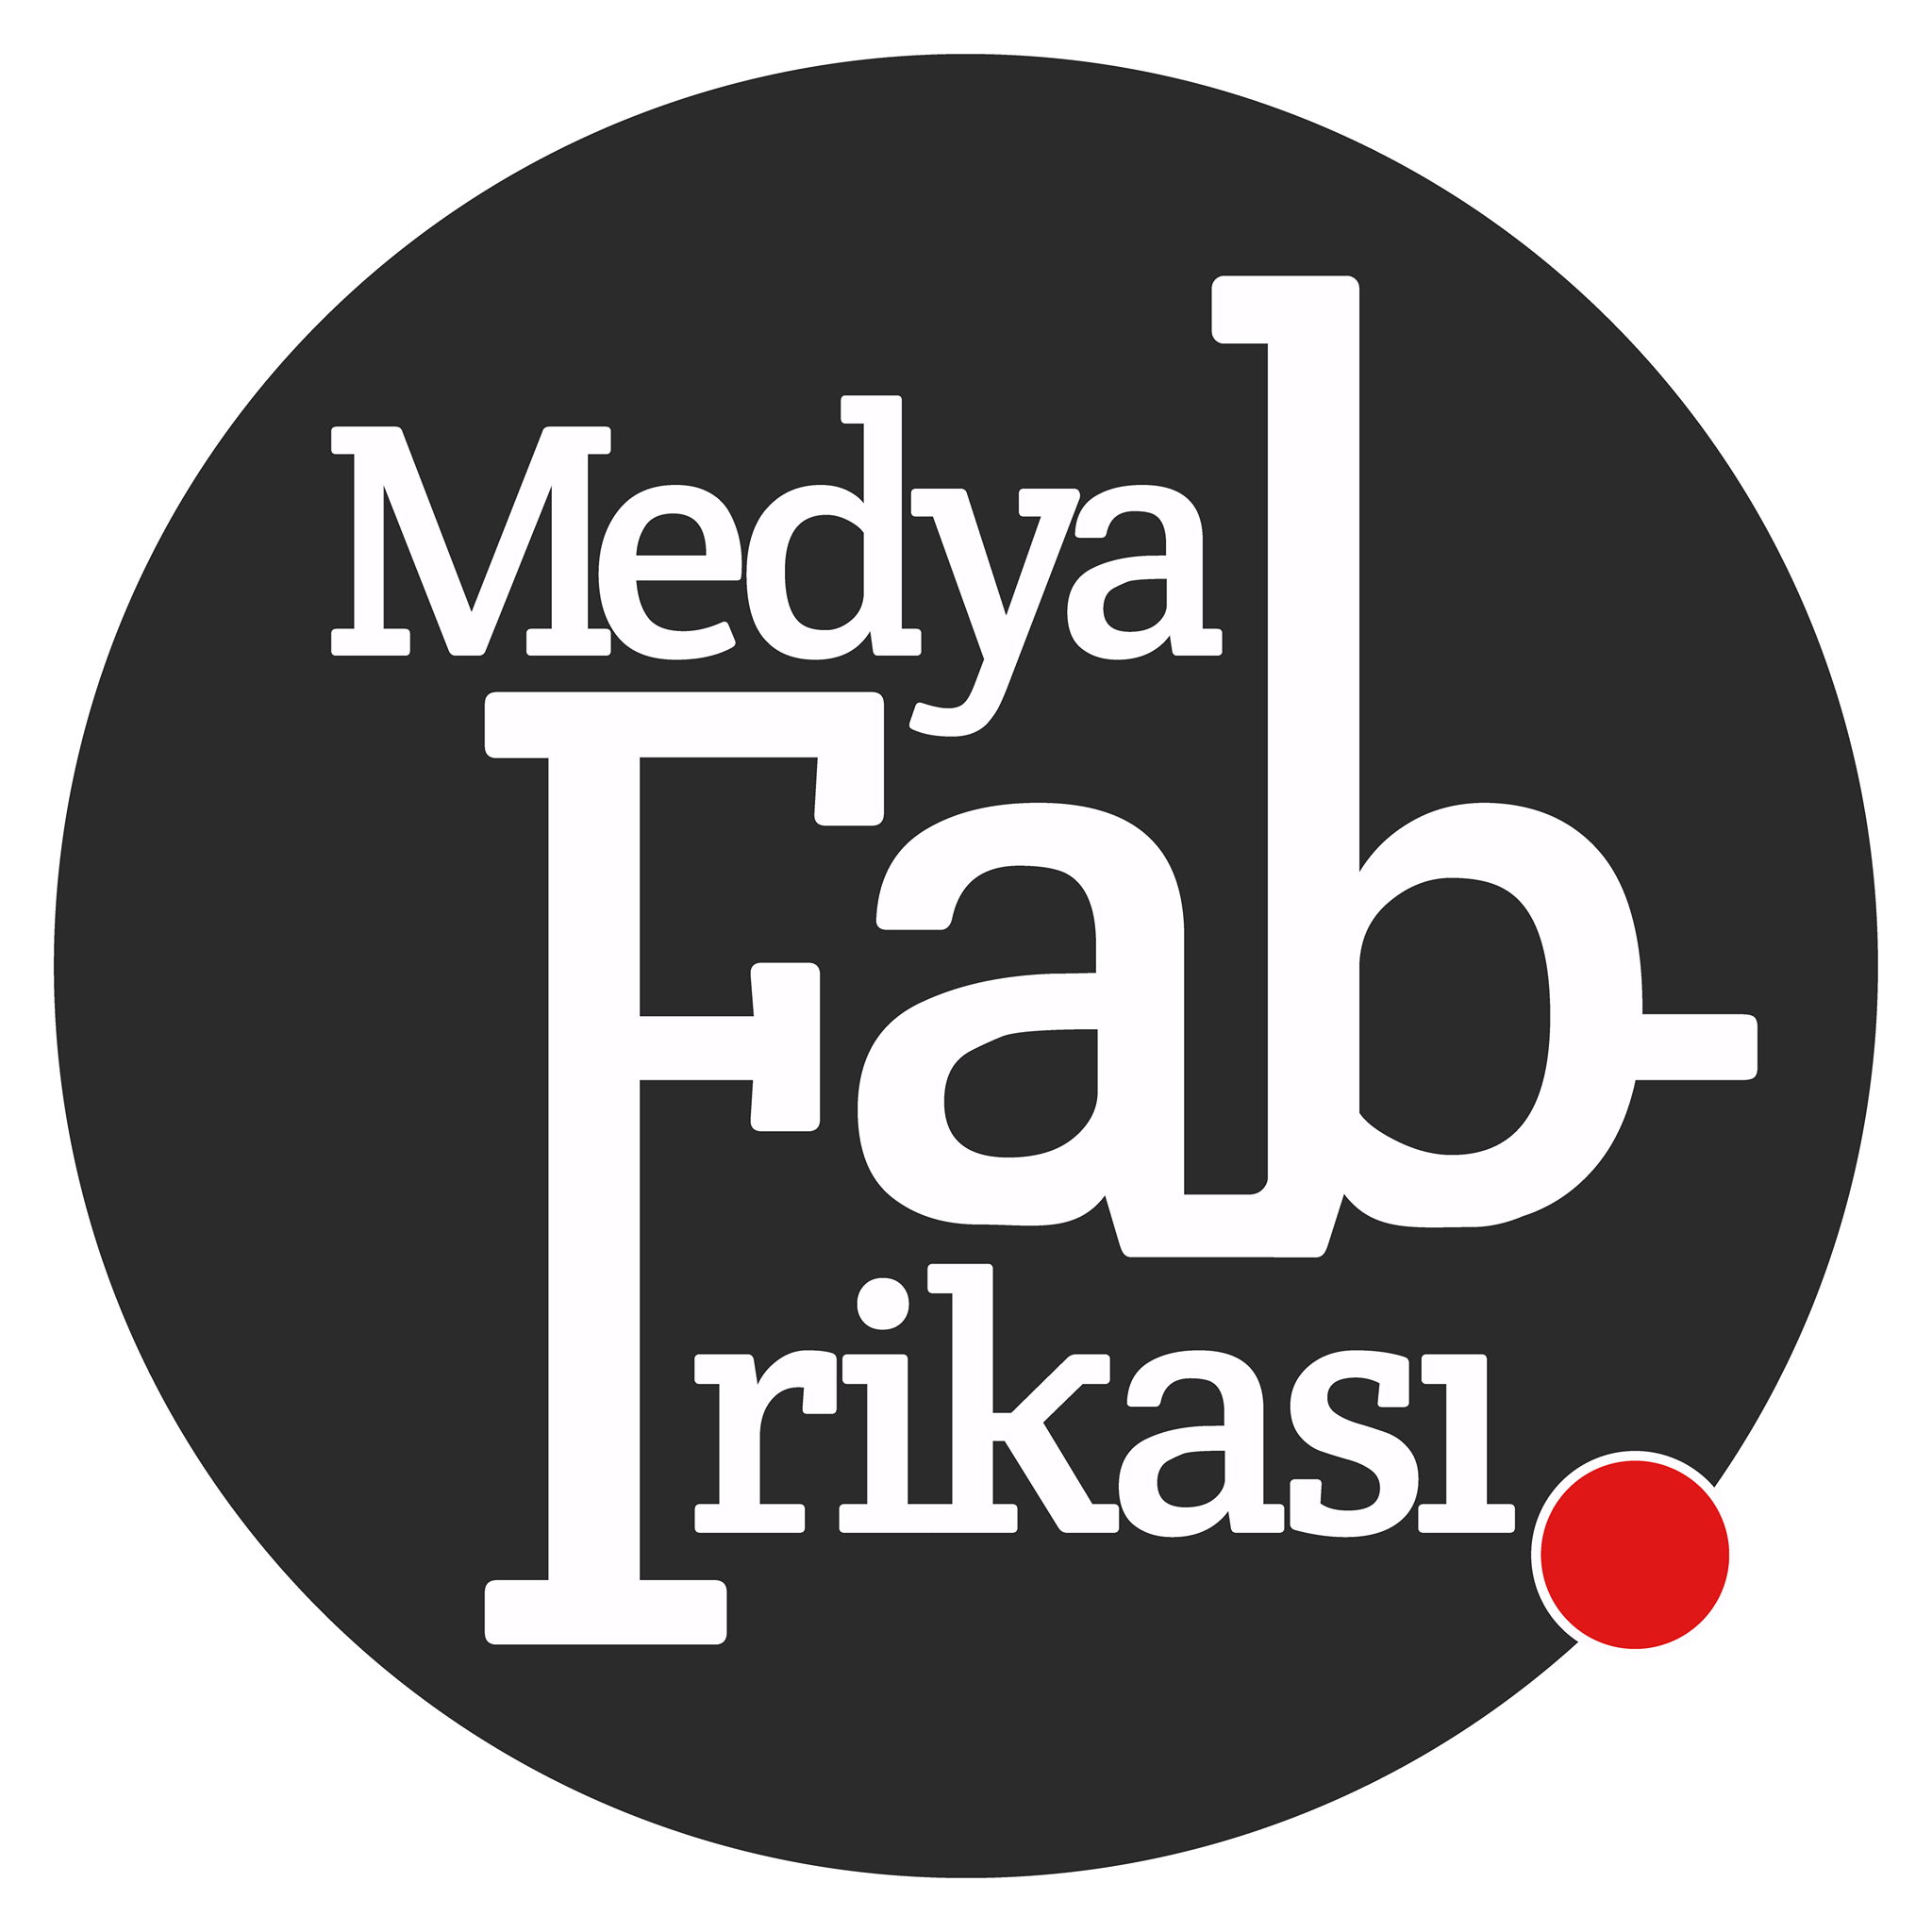 Medya Fabrikası